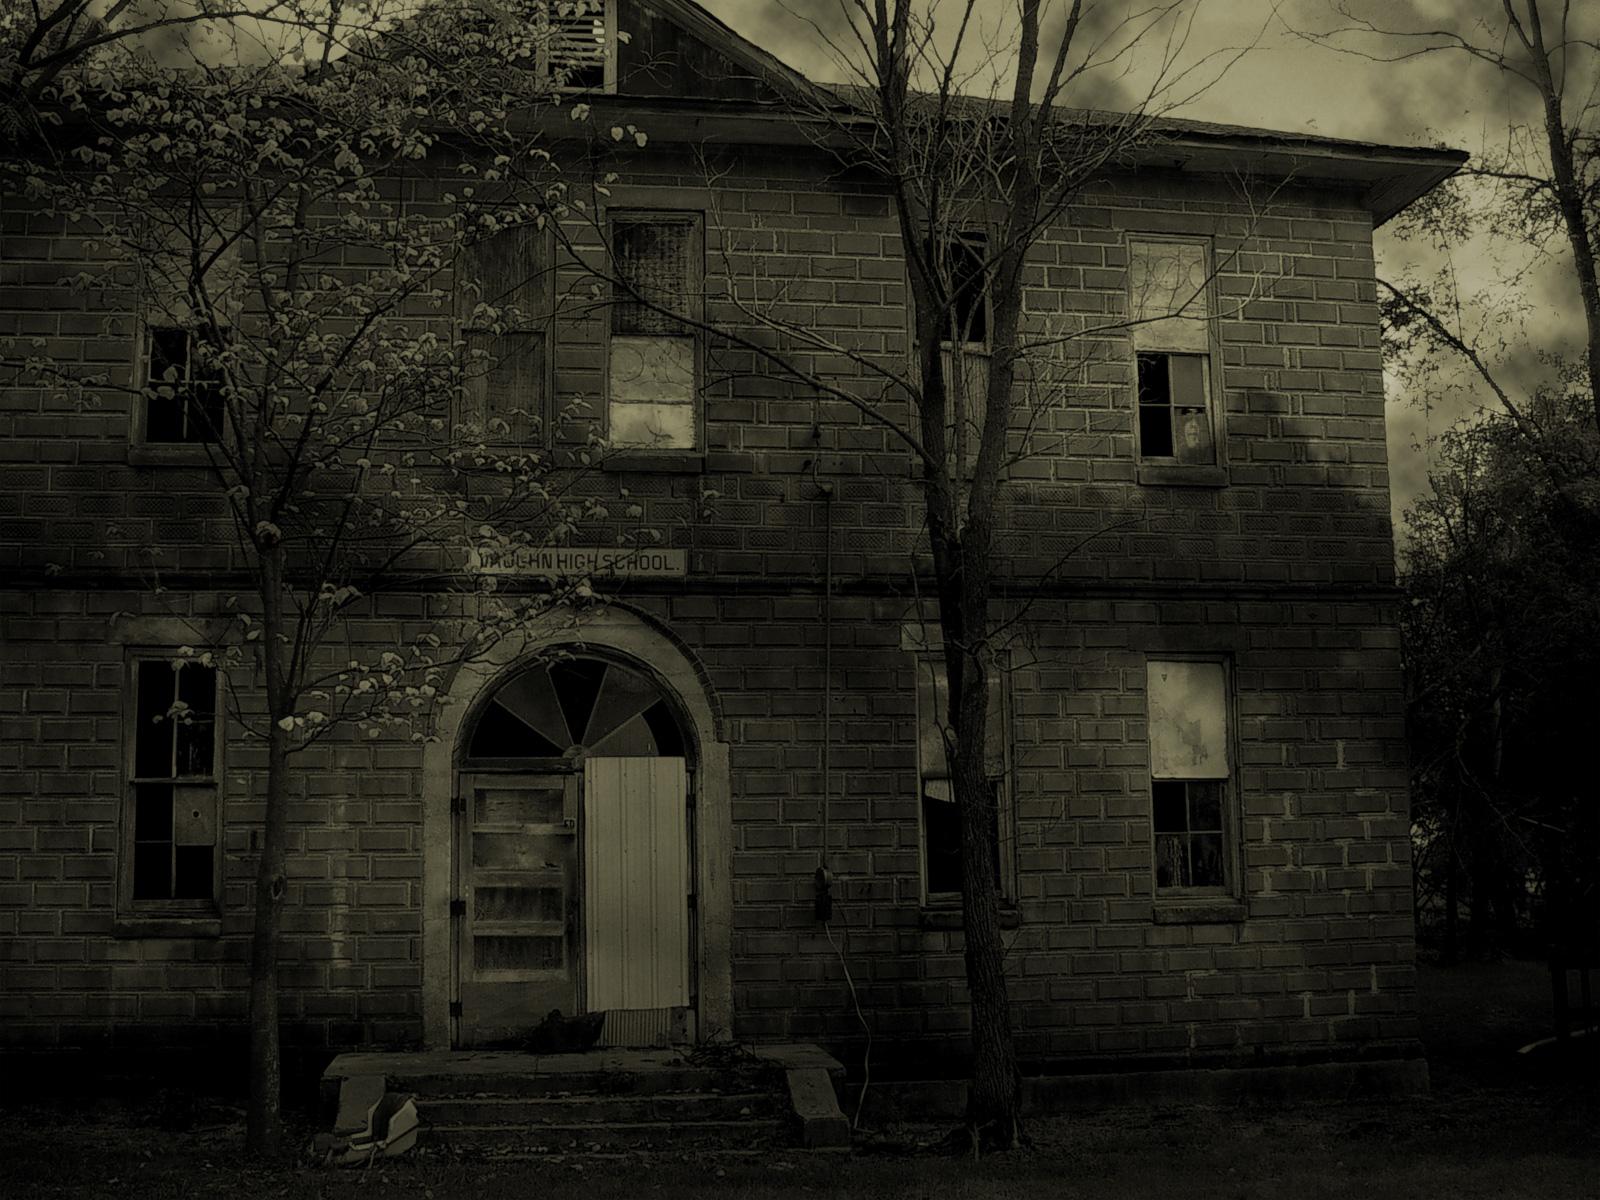 Haunted houseFantasy wallpaperCreepy House wallpaperfull hd 1600x1200